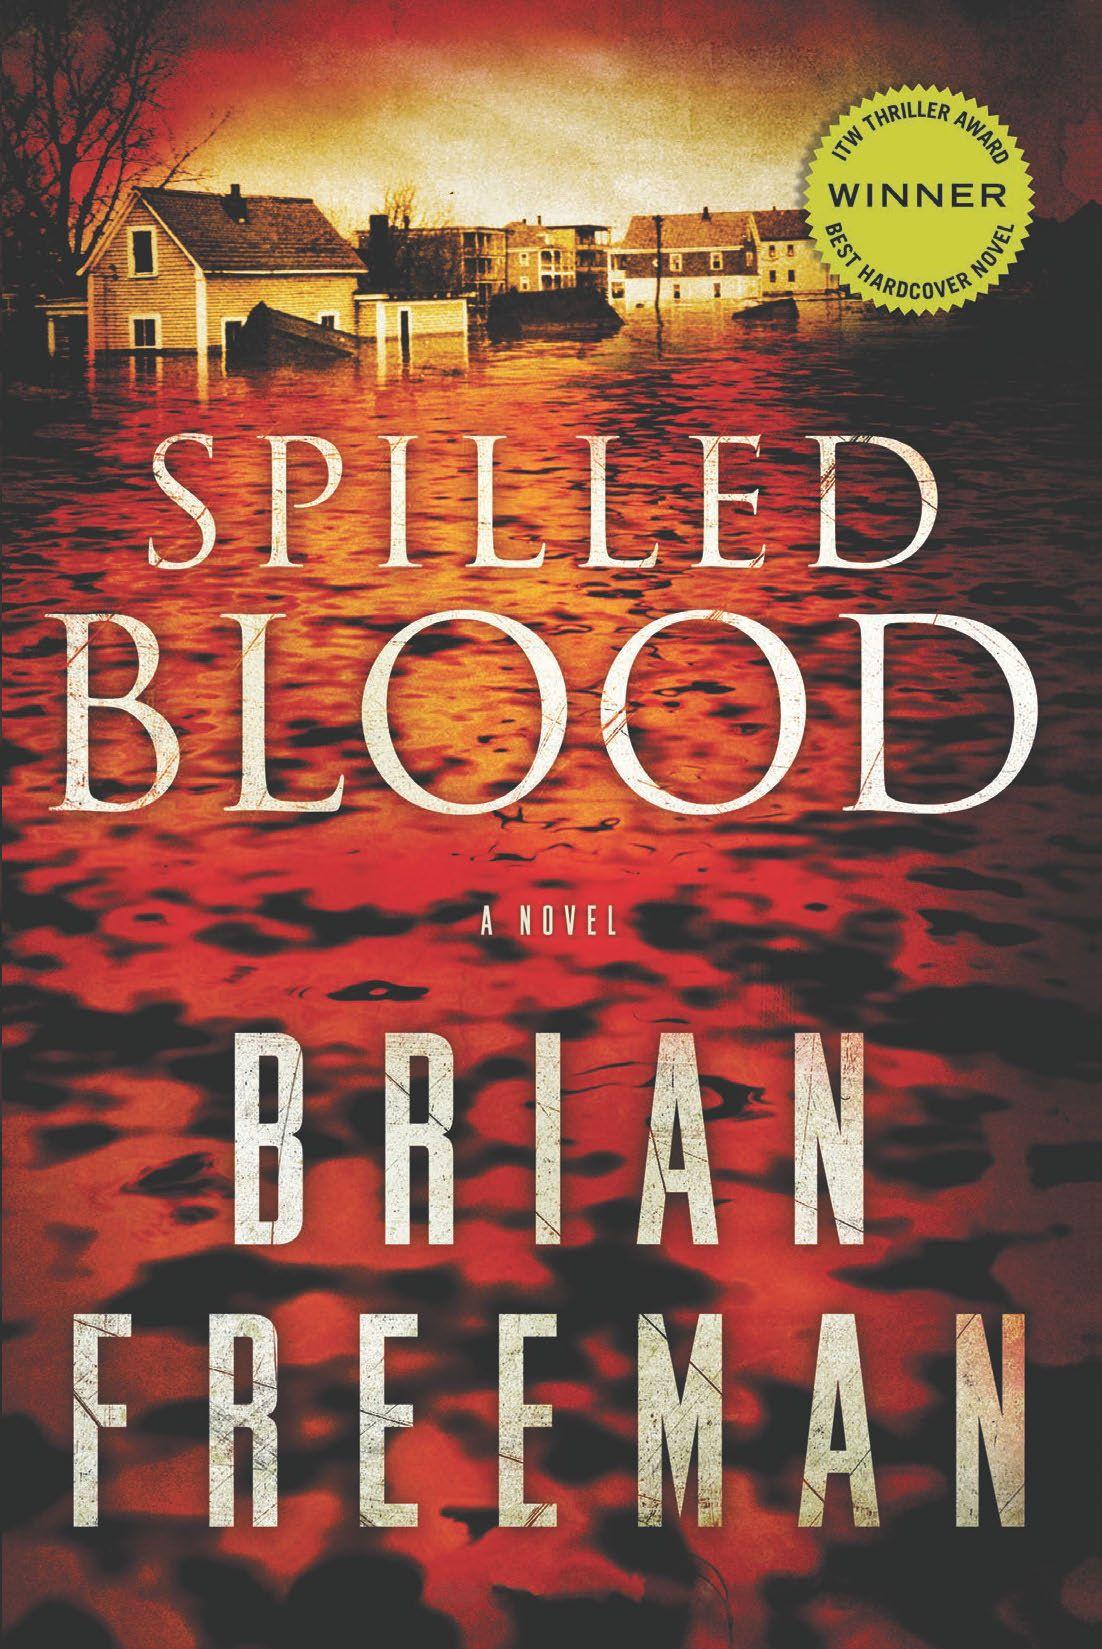 Spilled Blood Won The Award For Best Hardcover Novel In The International  Thriller Writers Awards